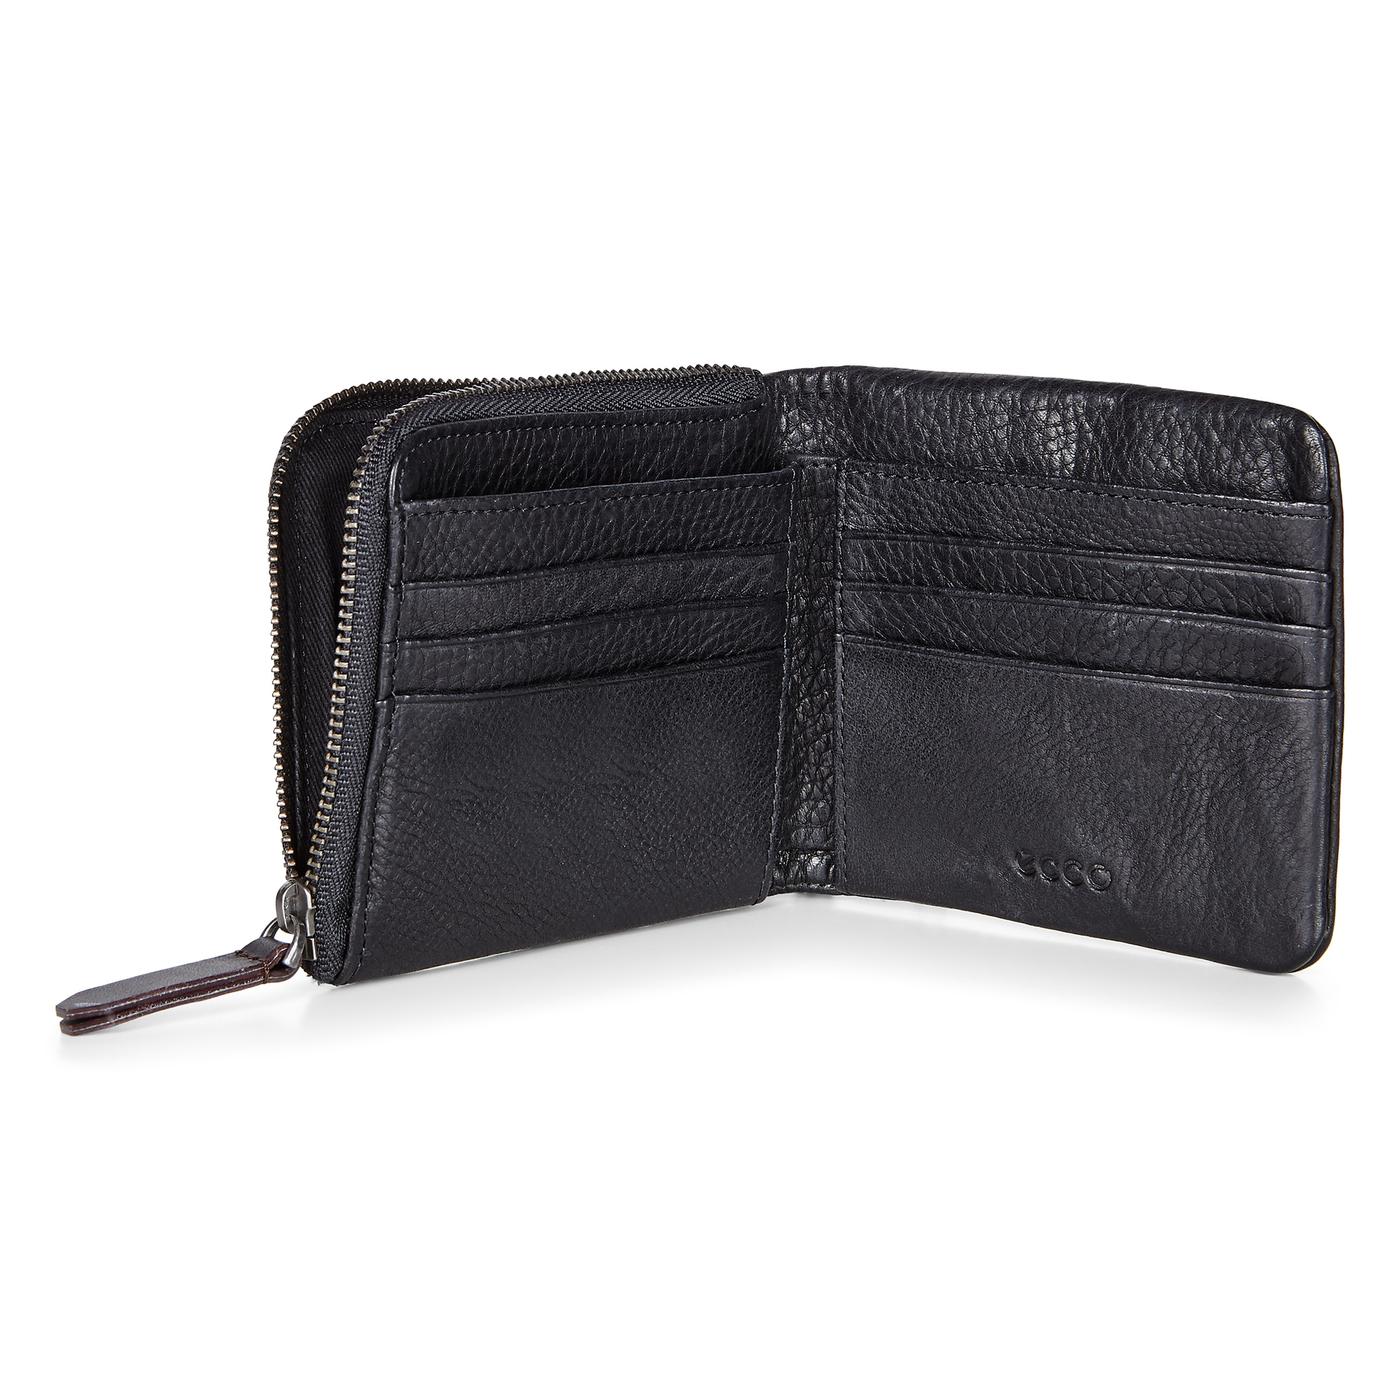 ECCO Ioma Casual Double Wallet